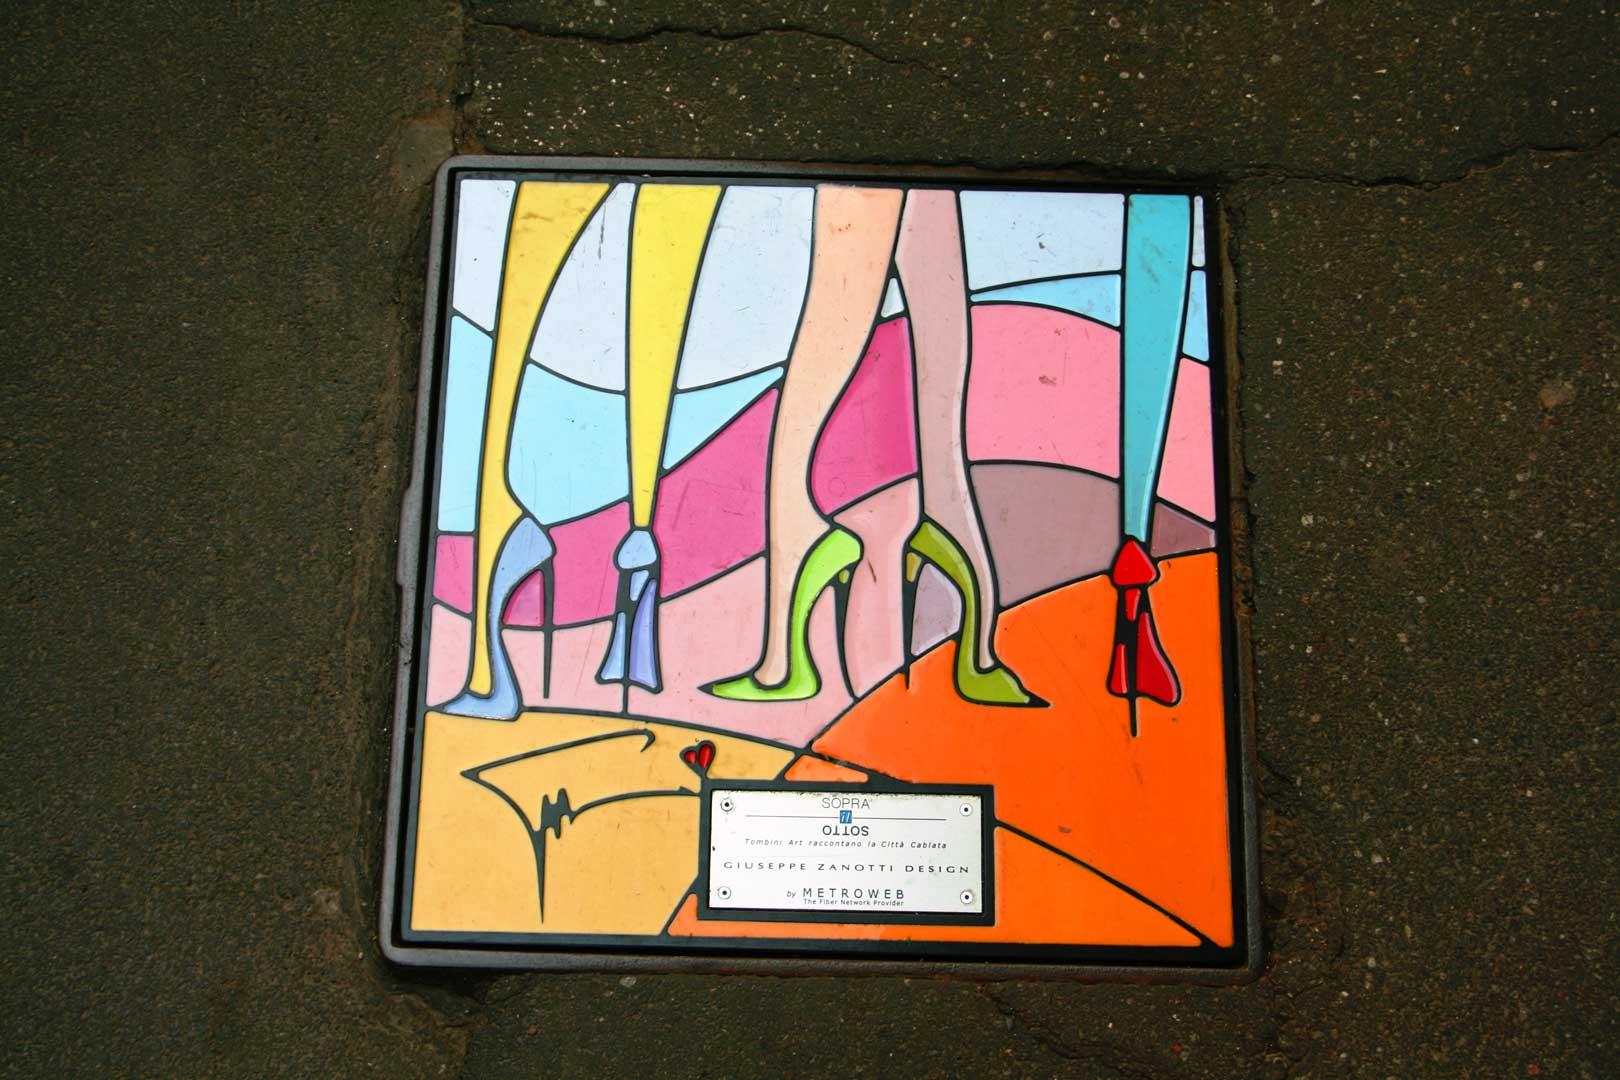 Manholes on the catwalk